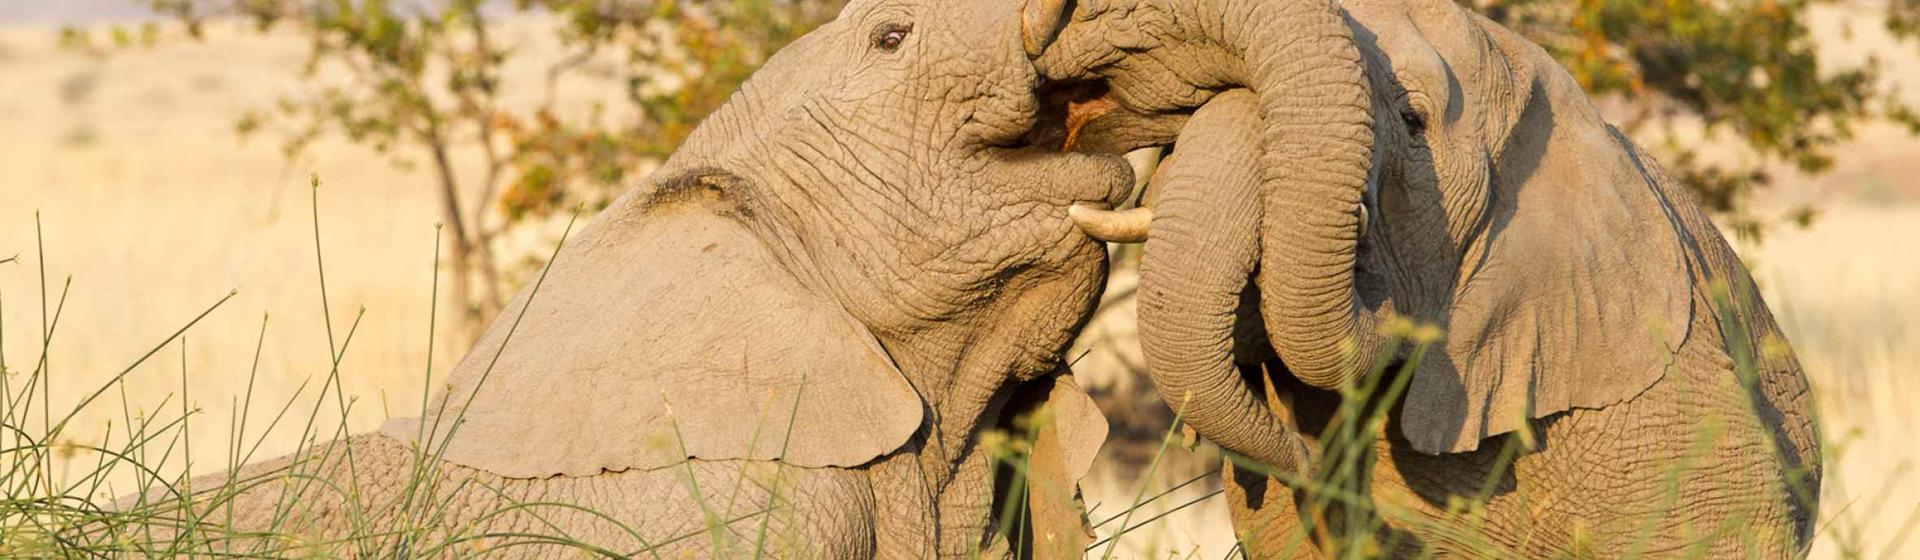 23 Days East Africa Wildlife,Gorillas Trekking And Community Adventure